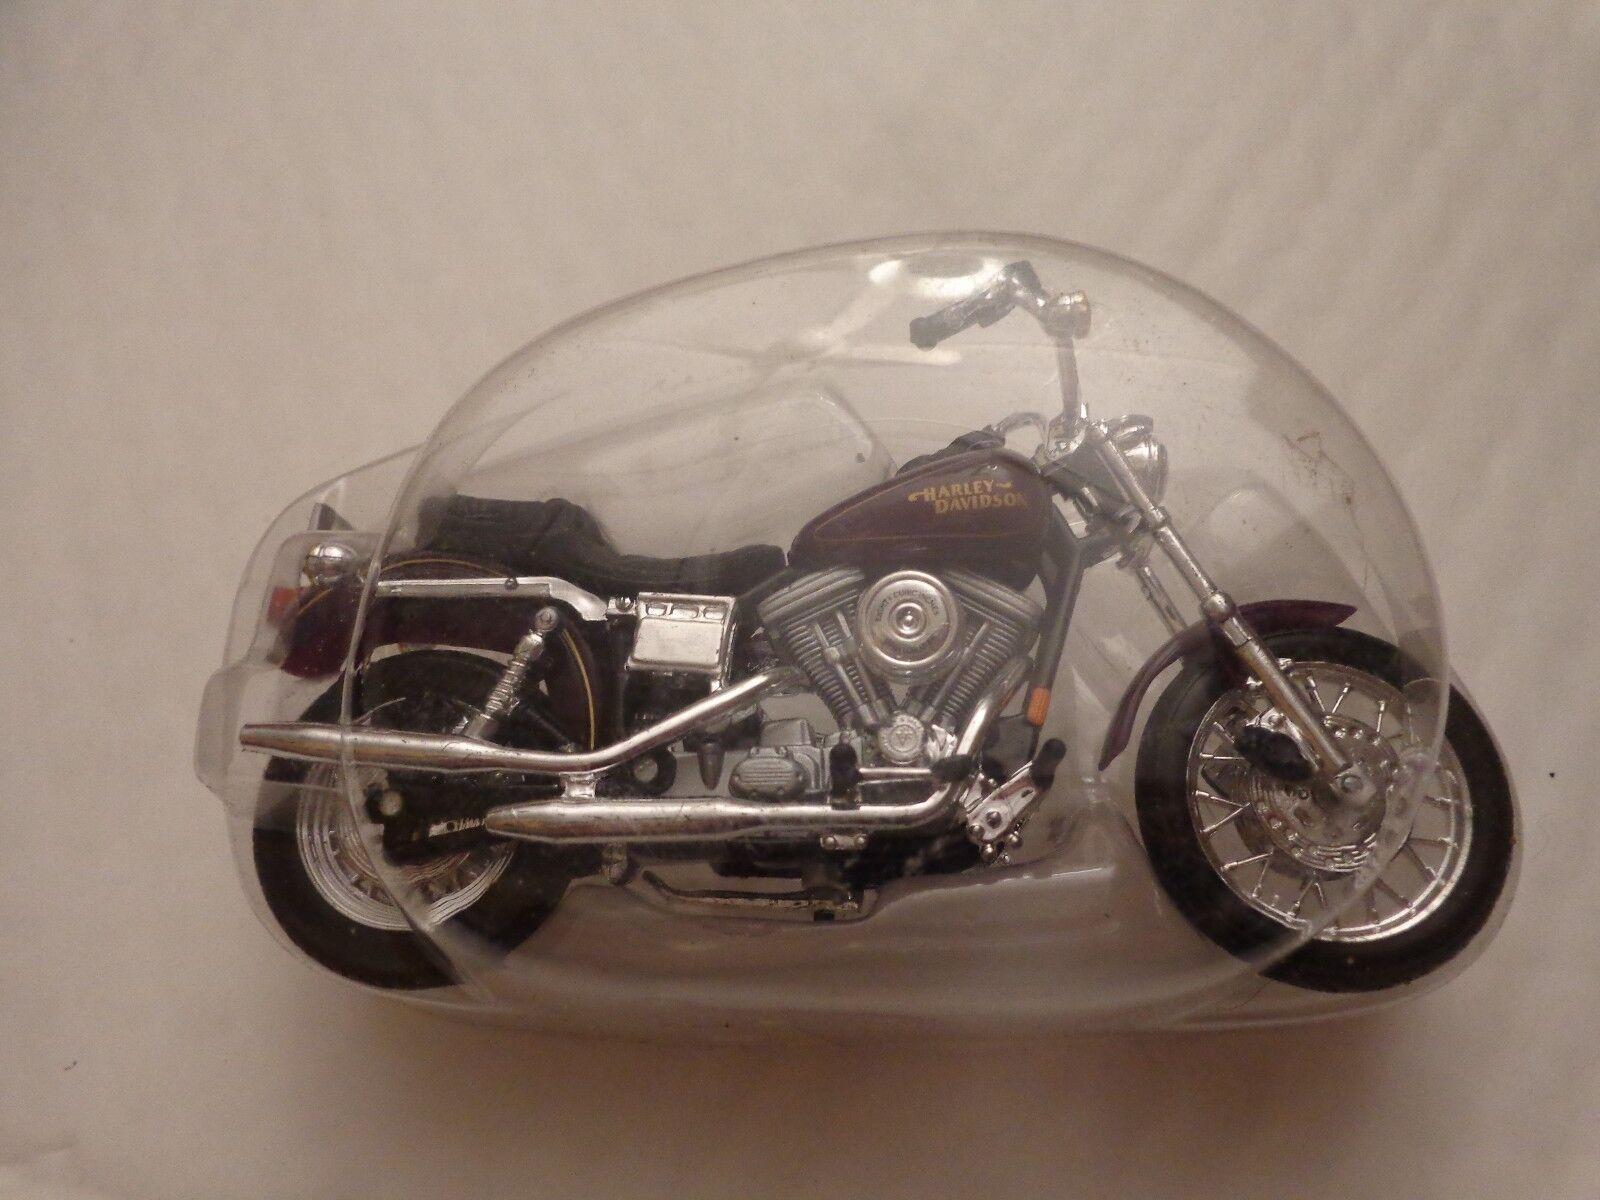 NEW 1 18 MAISTO - 1999 FXDL DYNA LOW RIDER HARLEY DAVIDSON - MOTORCYCLE BIKE